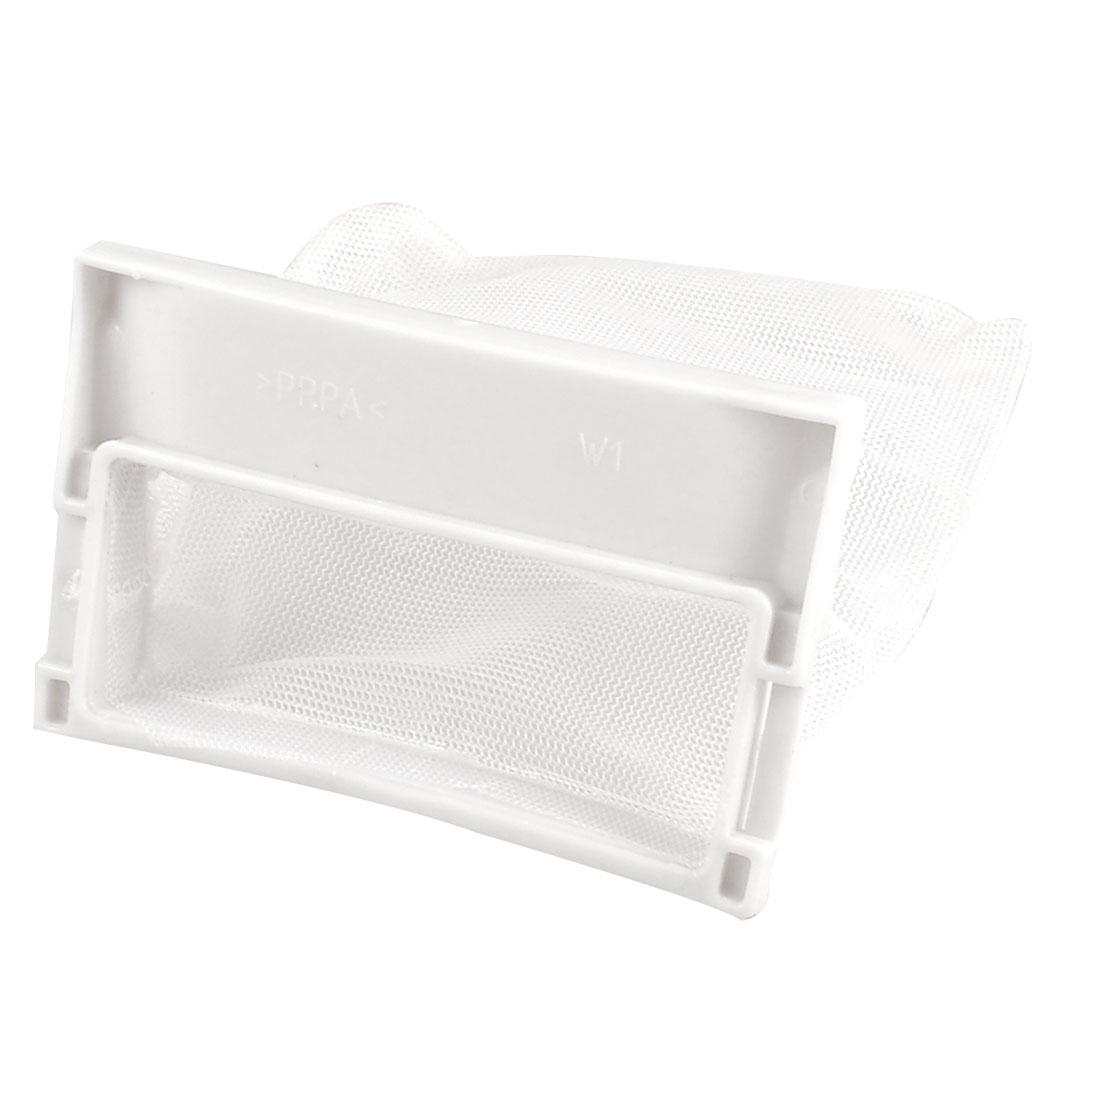 Washing Machine White Plastic Nylon Filter 11cm x 11.5cm Meshy Bag